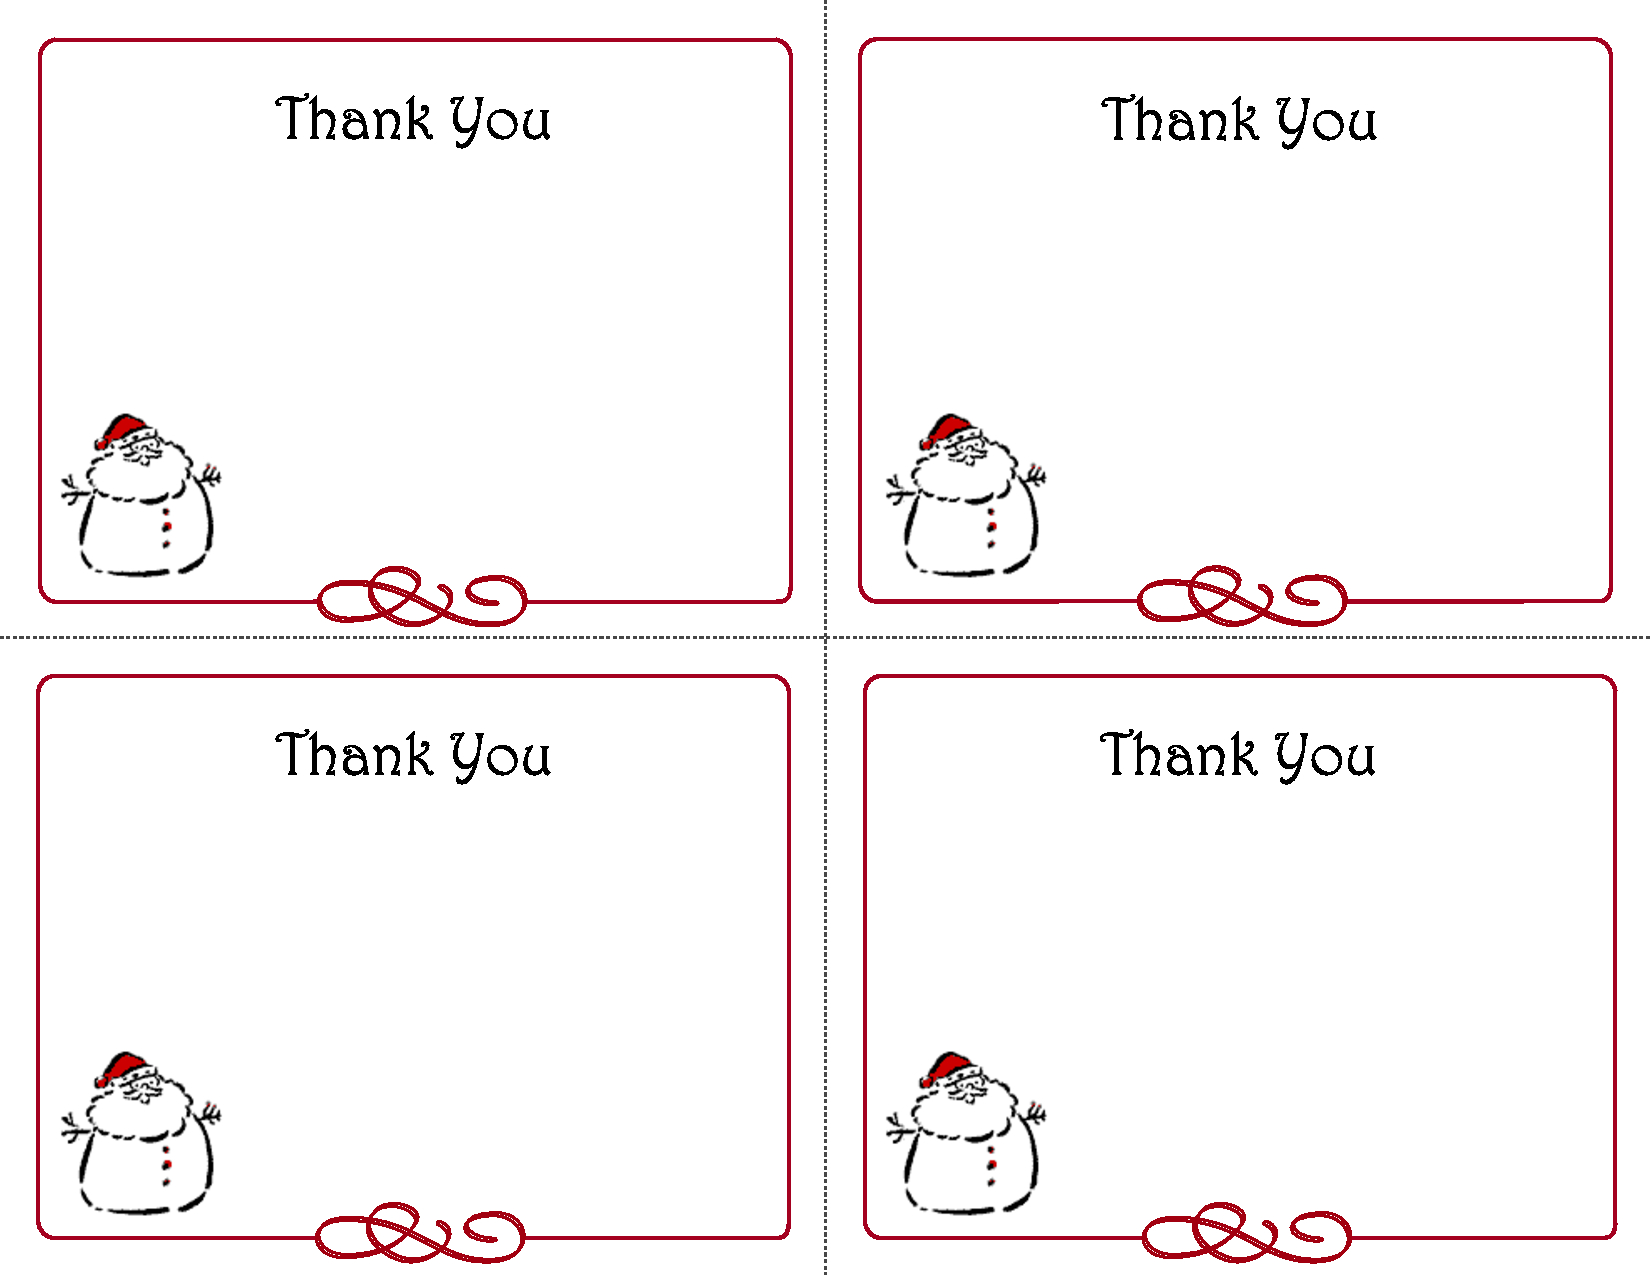 Free Thank You Cards Printable | Free Printable Holiday Gift Tags - Christmas Thank You Cards Printable Free